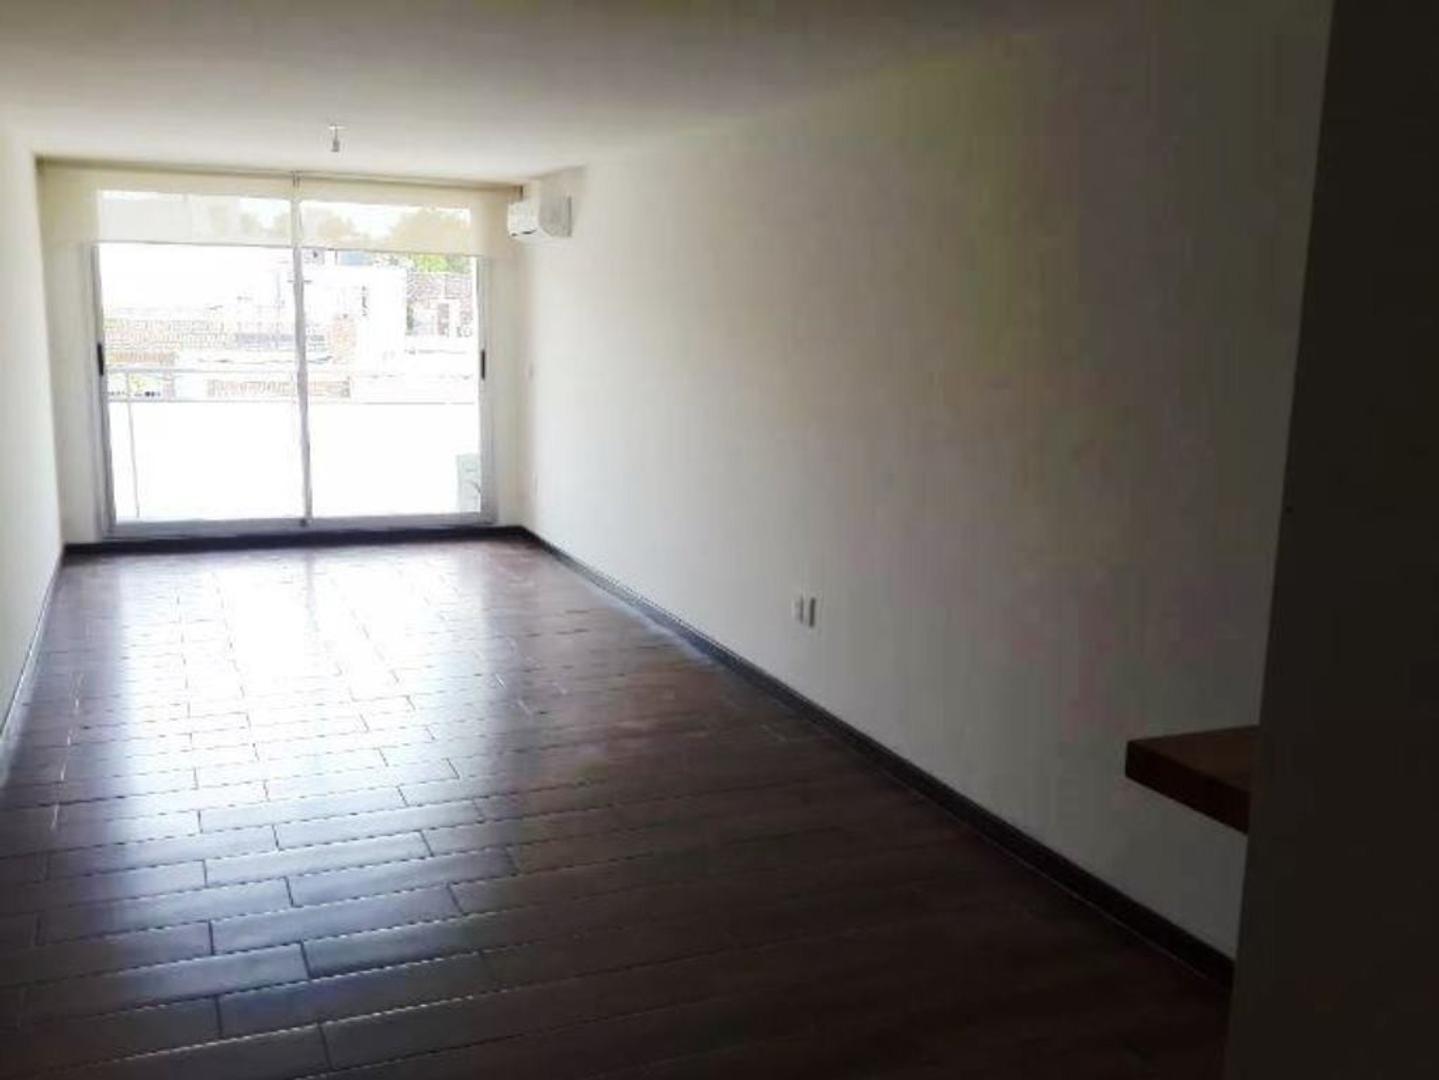 XINTEL(OTG-OTG-863) Departamento - Venta - Uruguay, Montevideo - MARCO BRUTO 1200